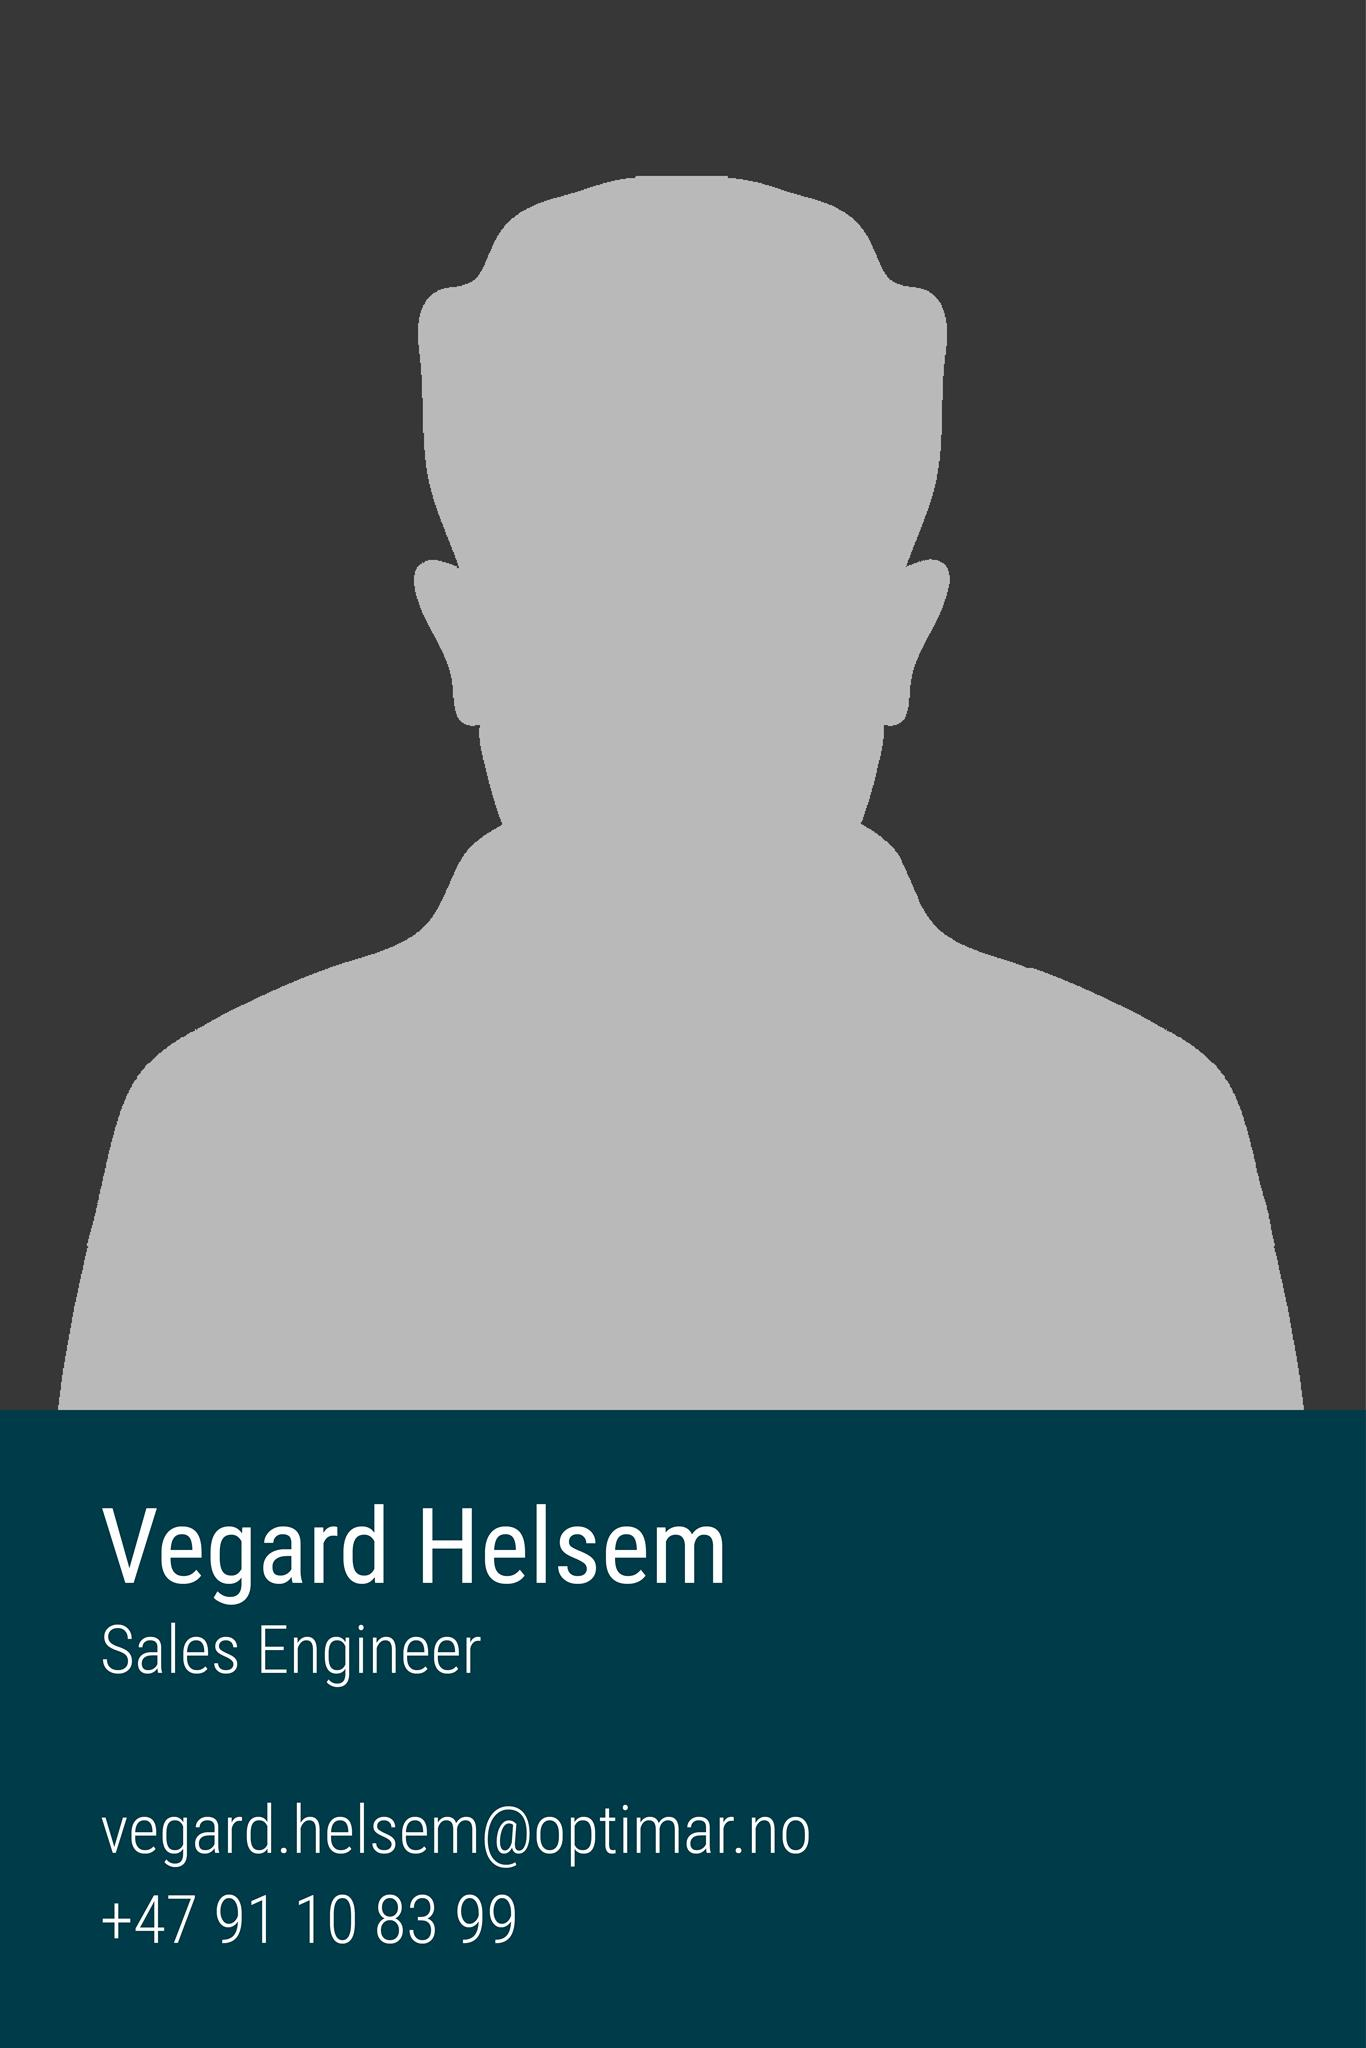 Vegard Helsem